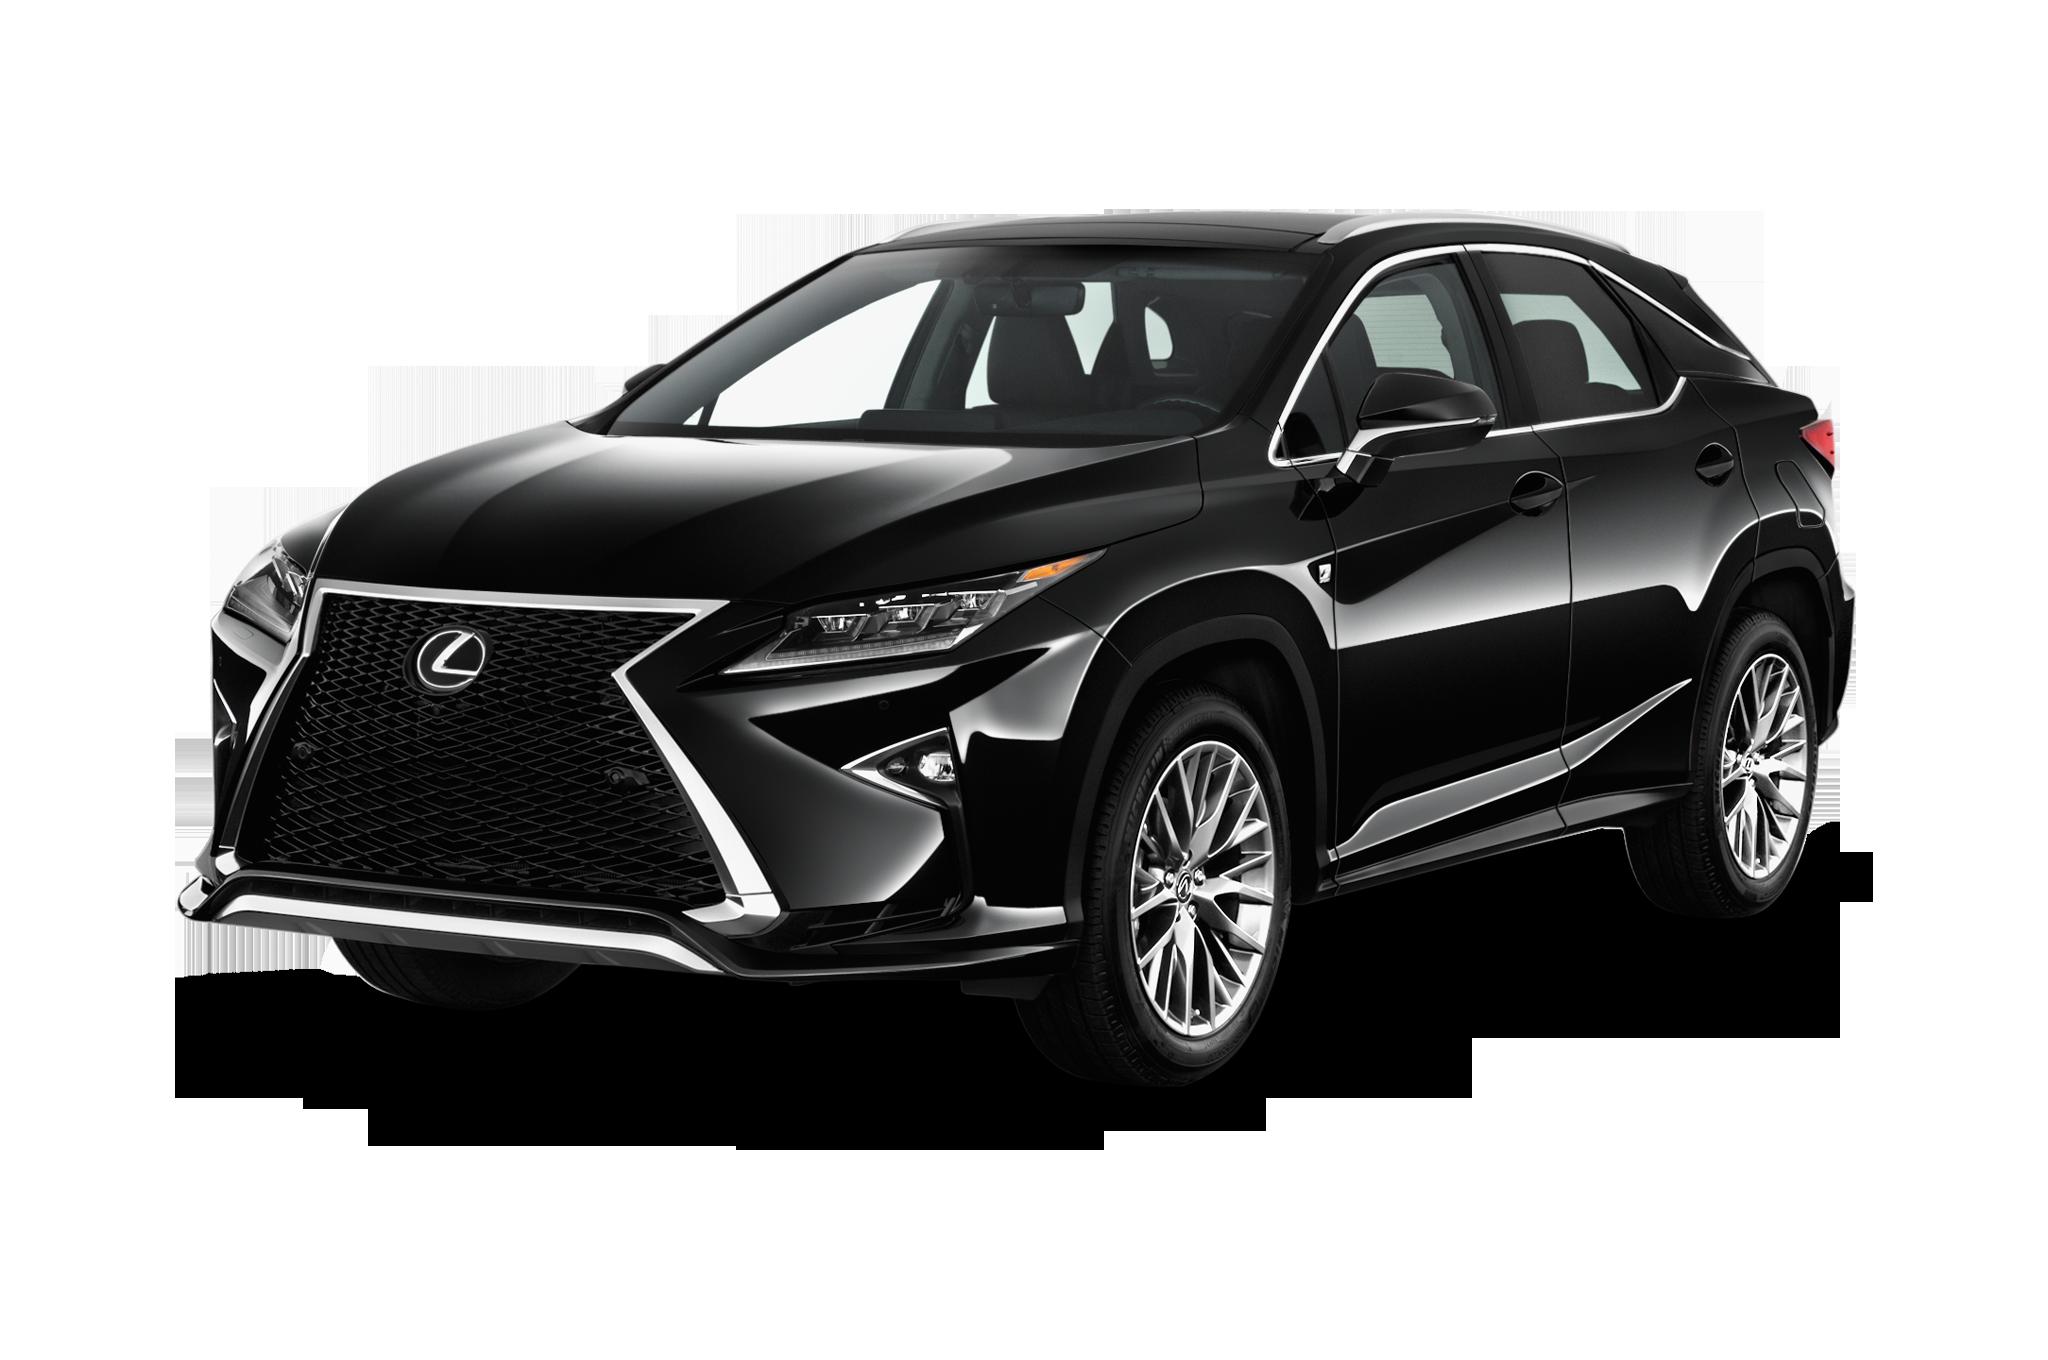 New 2017 Lexus RX 350 - Price, Photos, Reviews, Safety ...  |Lexus Rx450